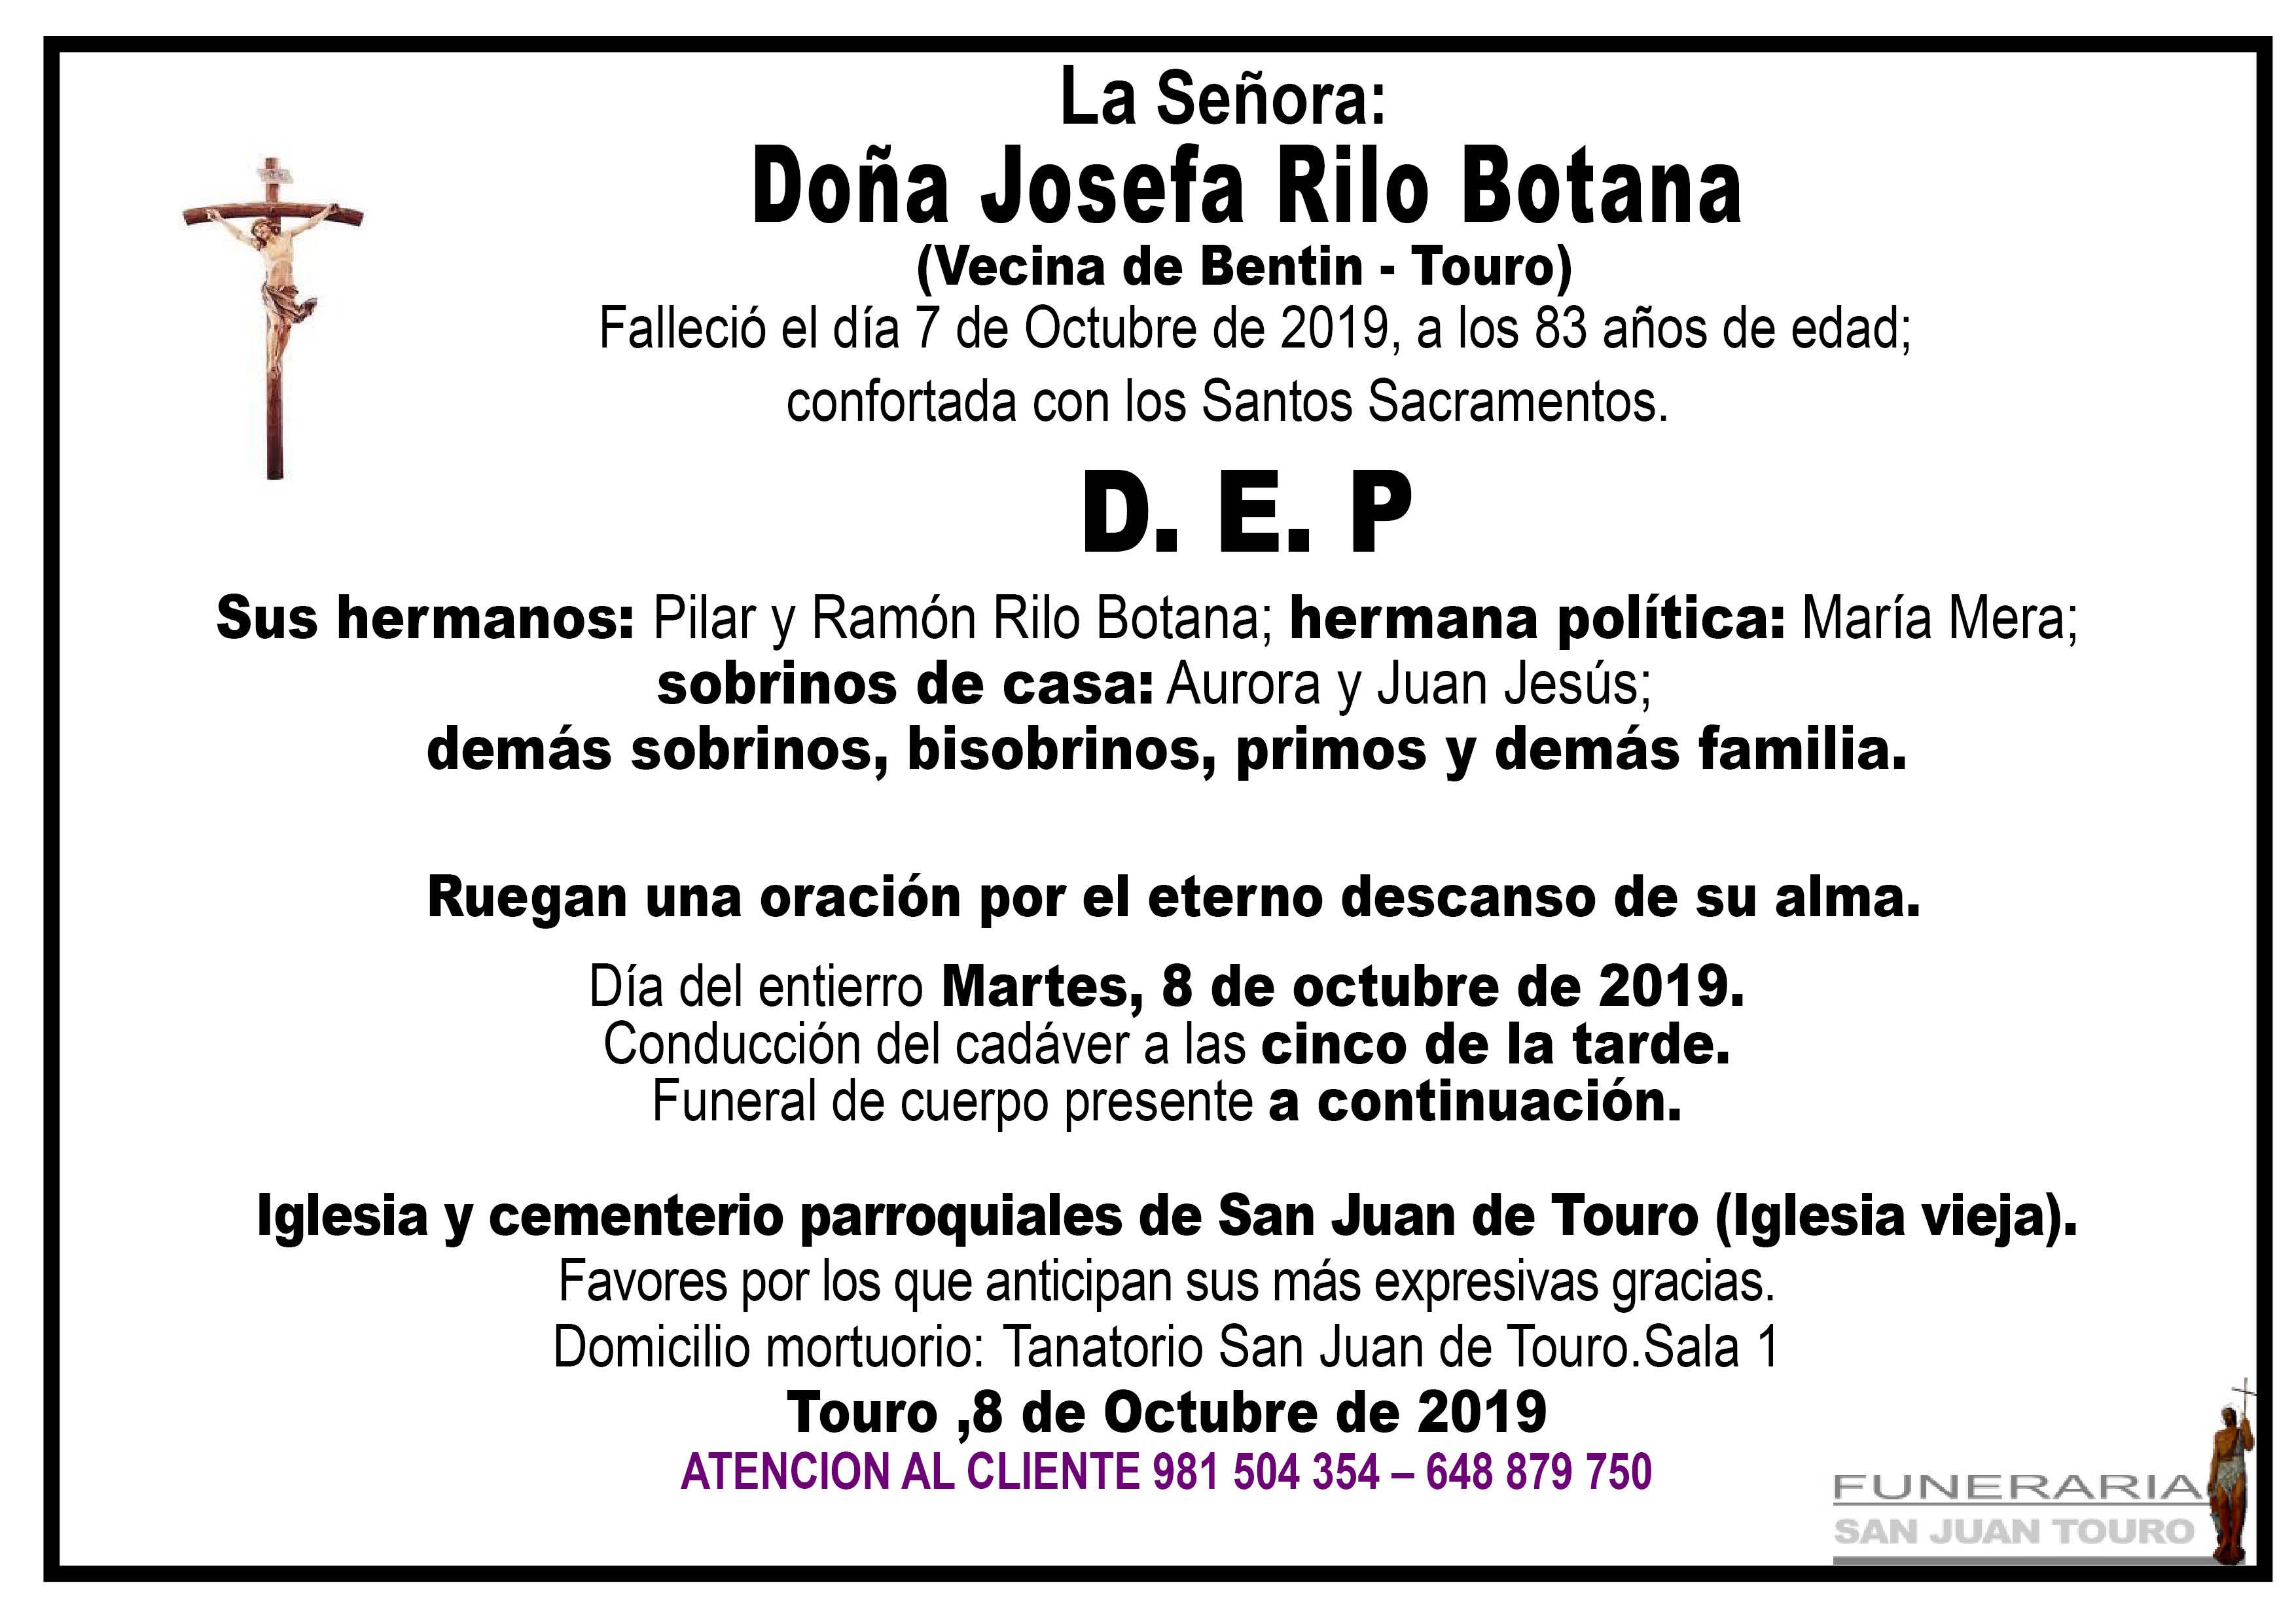 Esquela de SEPELIO DE DOÑA JOSEFA RILO BOTANA